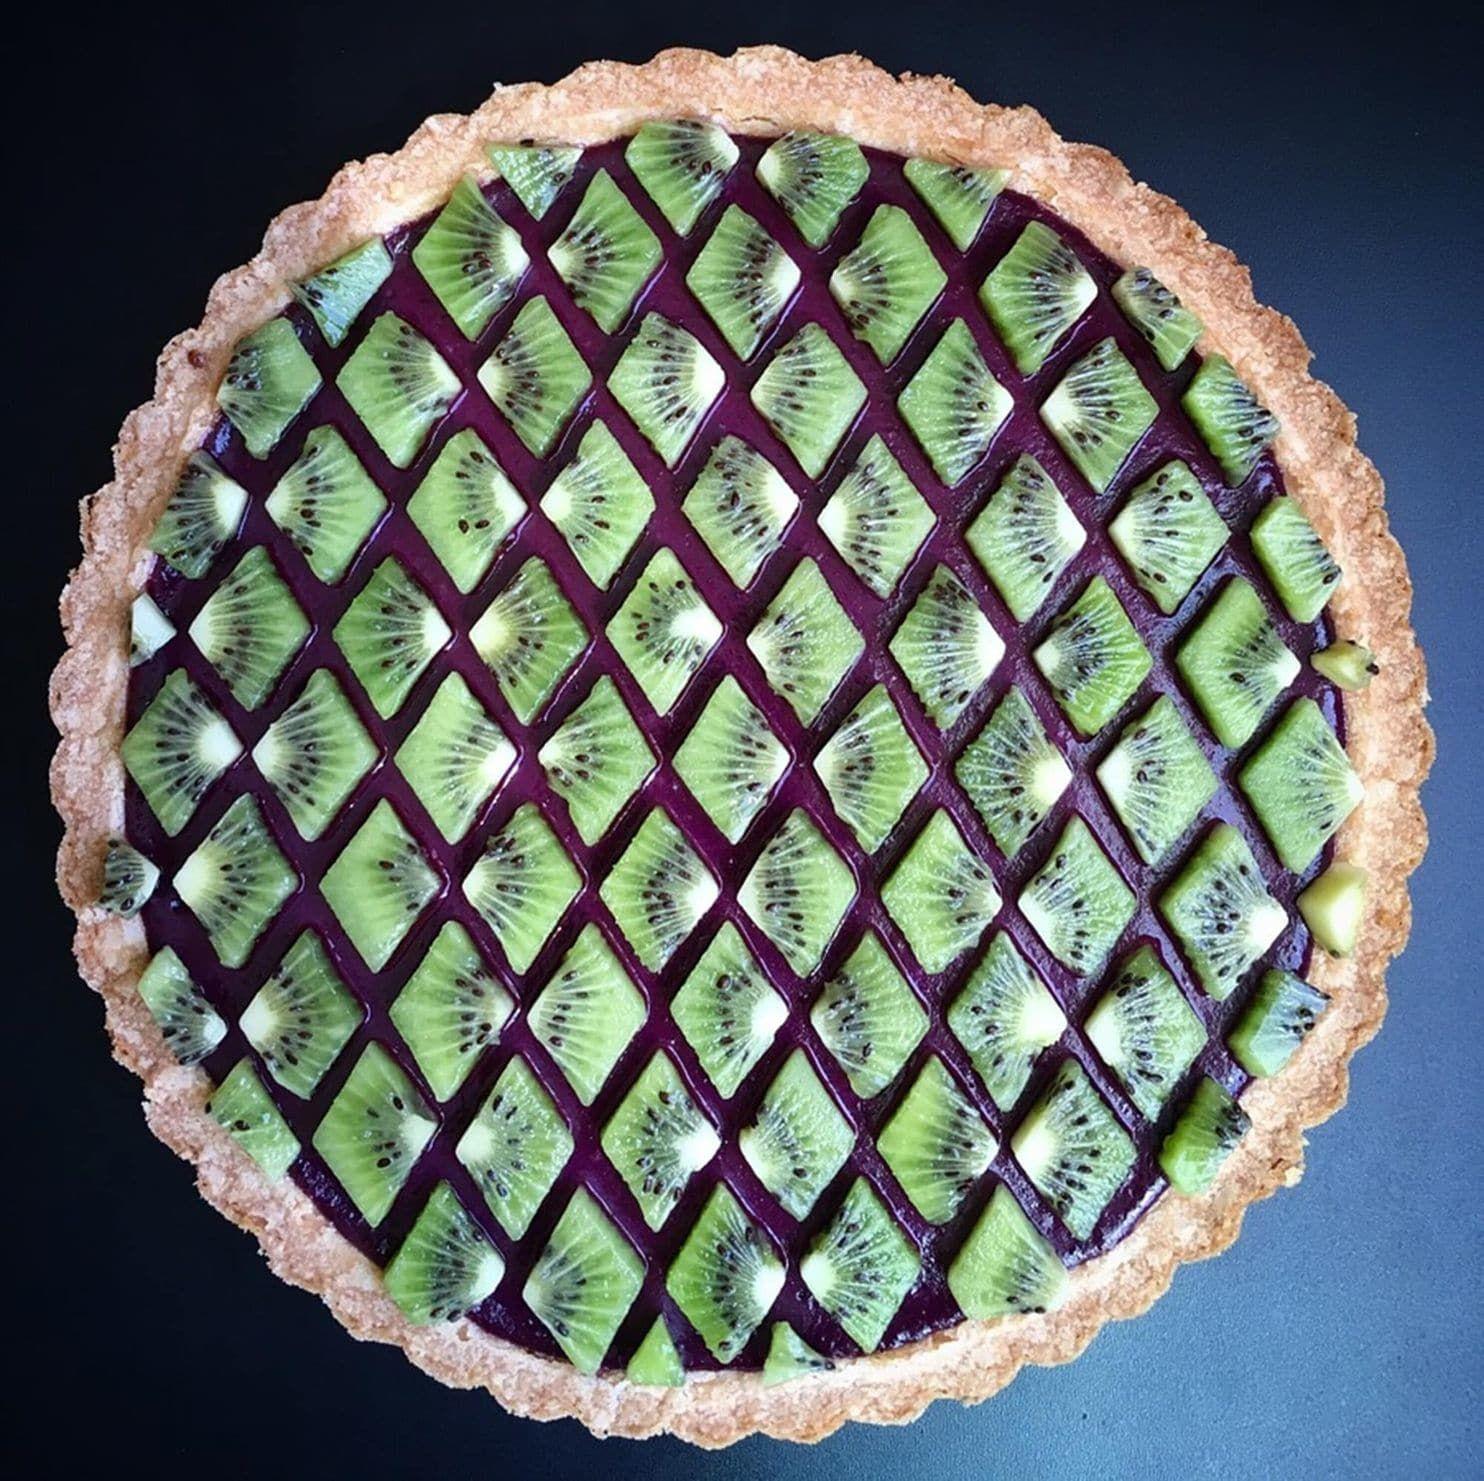 Lokokitchen's geometric pies are an Instagram sensation - The Washington Post